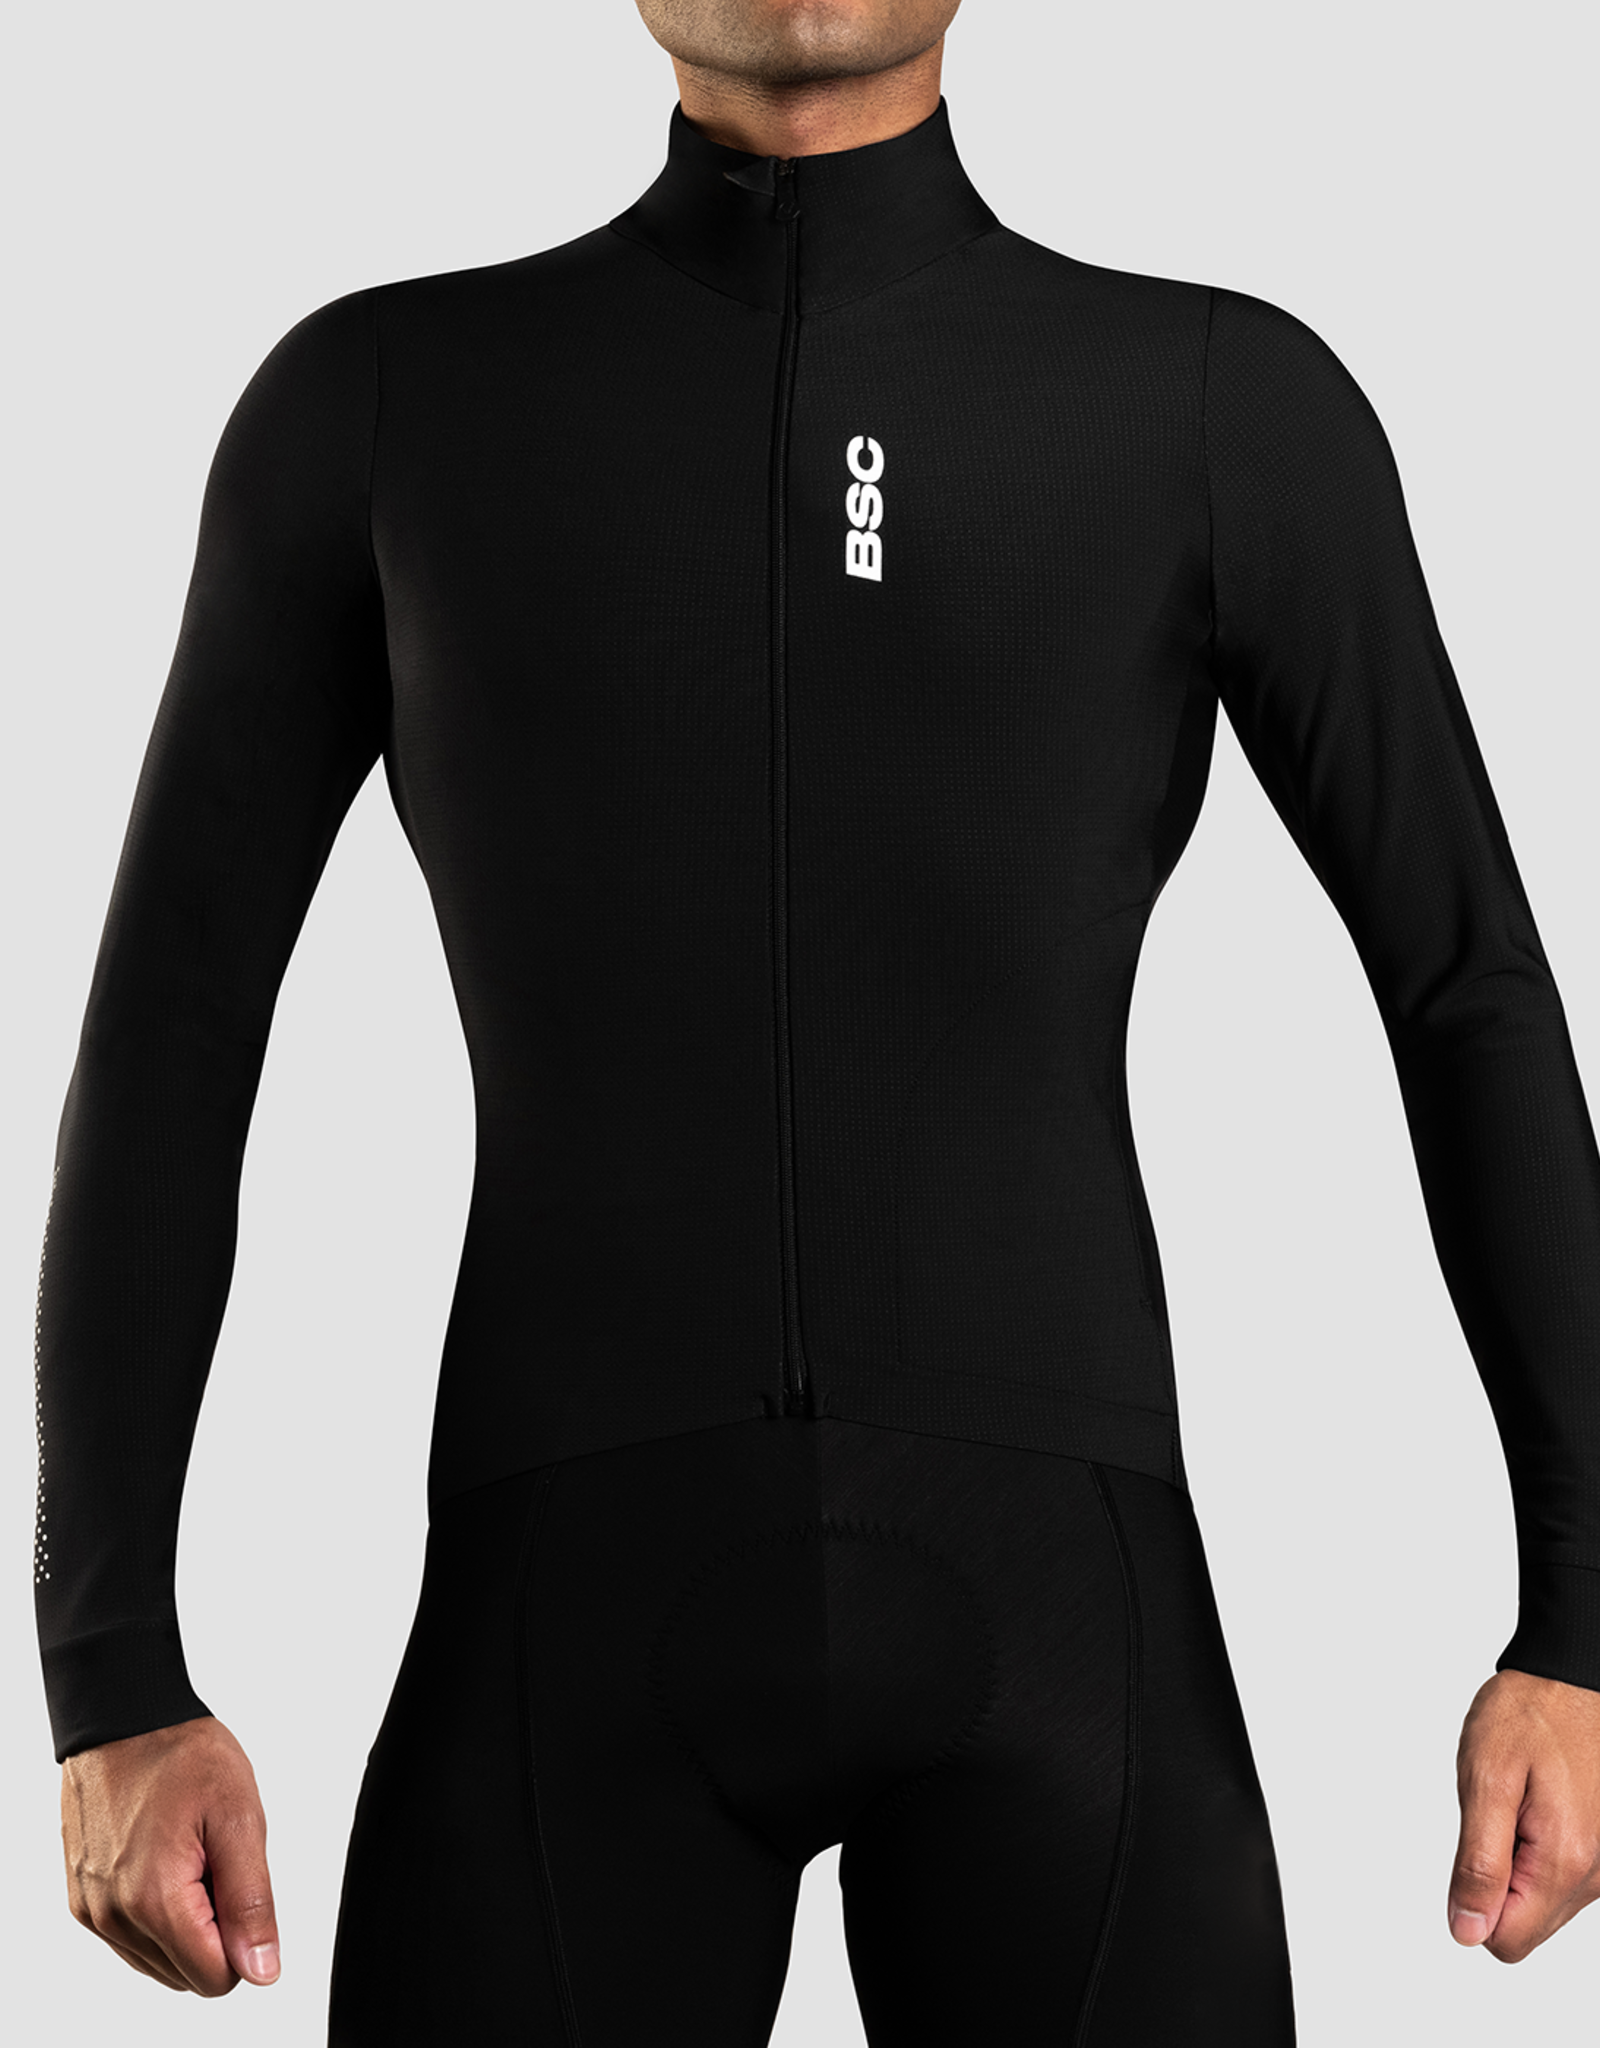 Black Sheep Cycling Men's Elements Thermal Jersey - Black